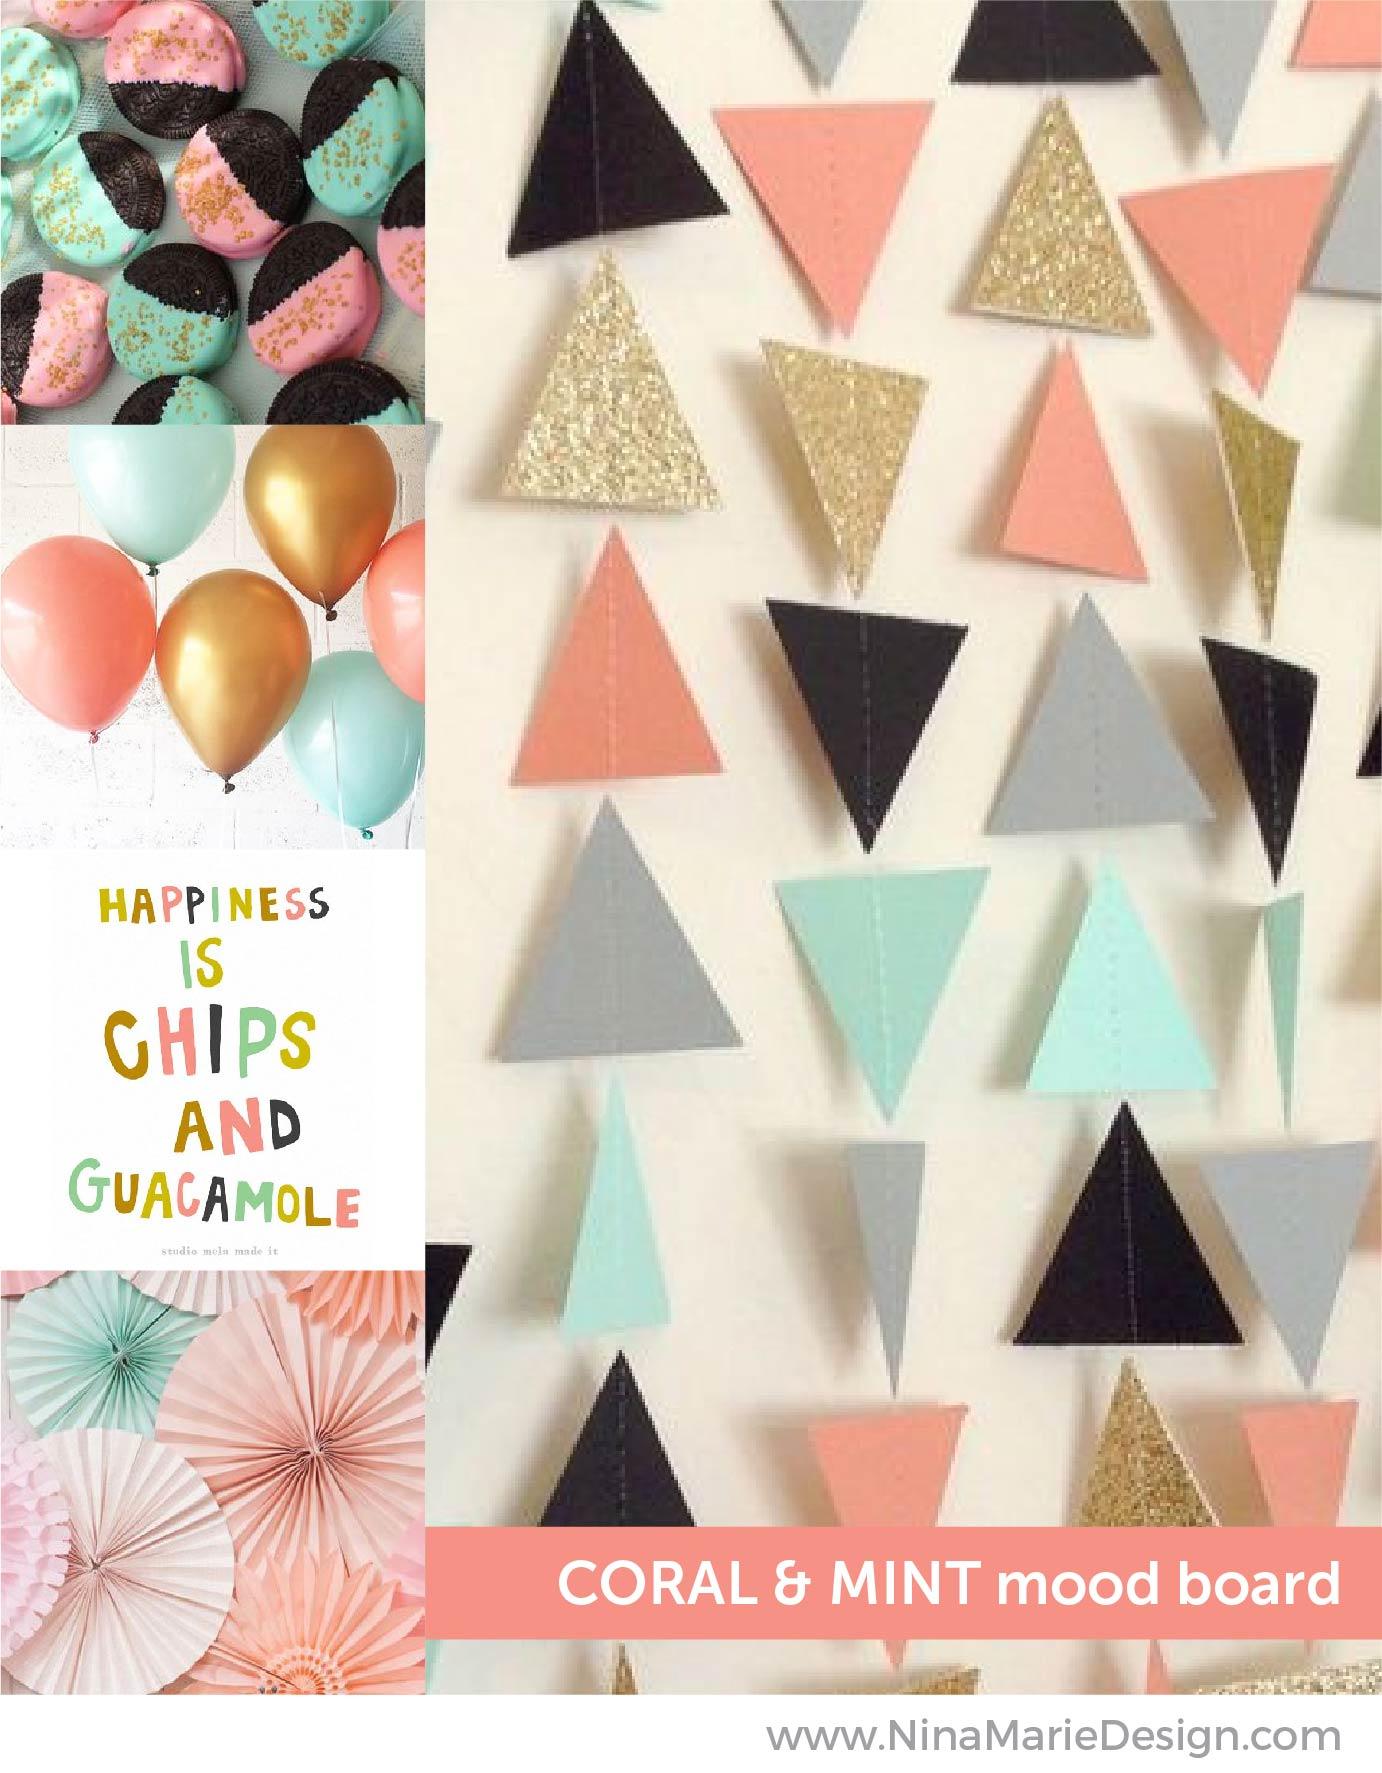 Coral and Mint Mood Board   Nina-Marie Design